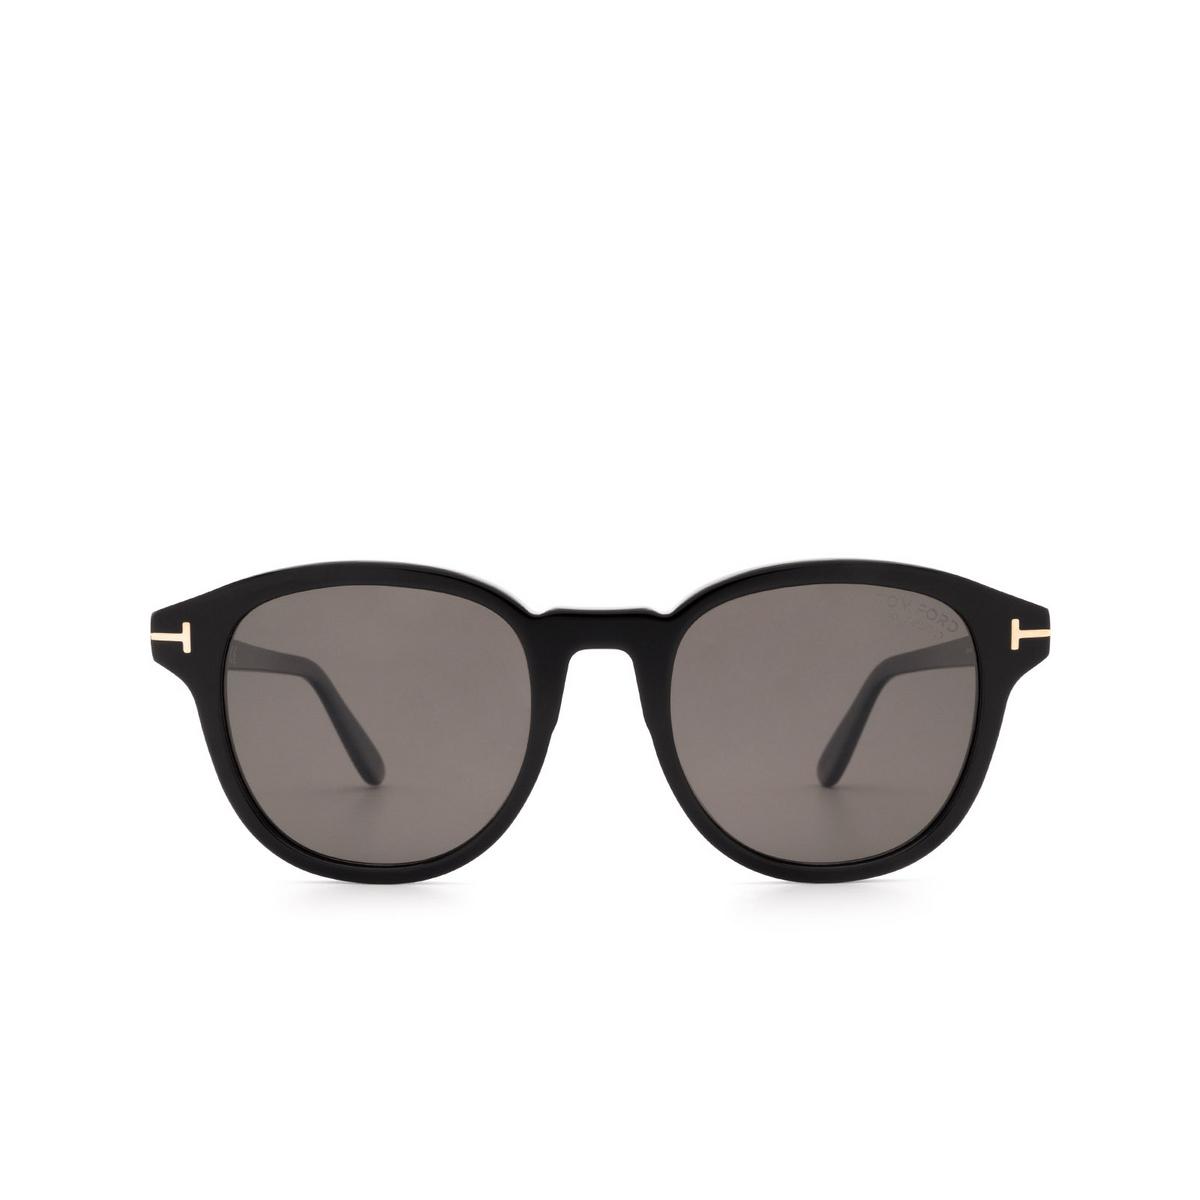 Tom Ford® Square Sunglasses: Jameson FT0752 color Black 01D.